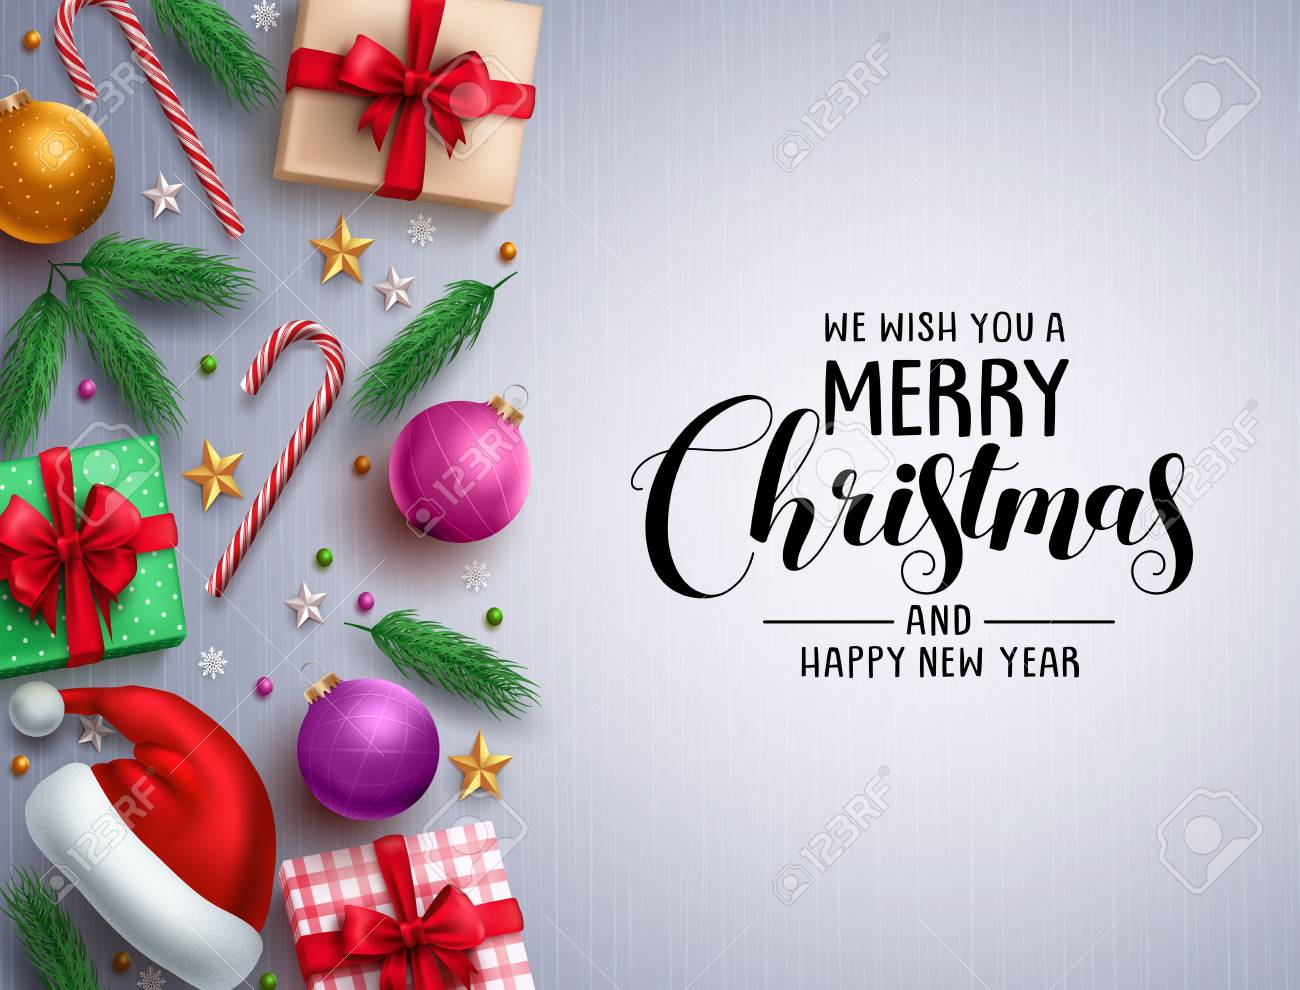 Christmas Vector Background Free.Christmas Vector Background Template Merry Christmas Greeting